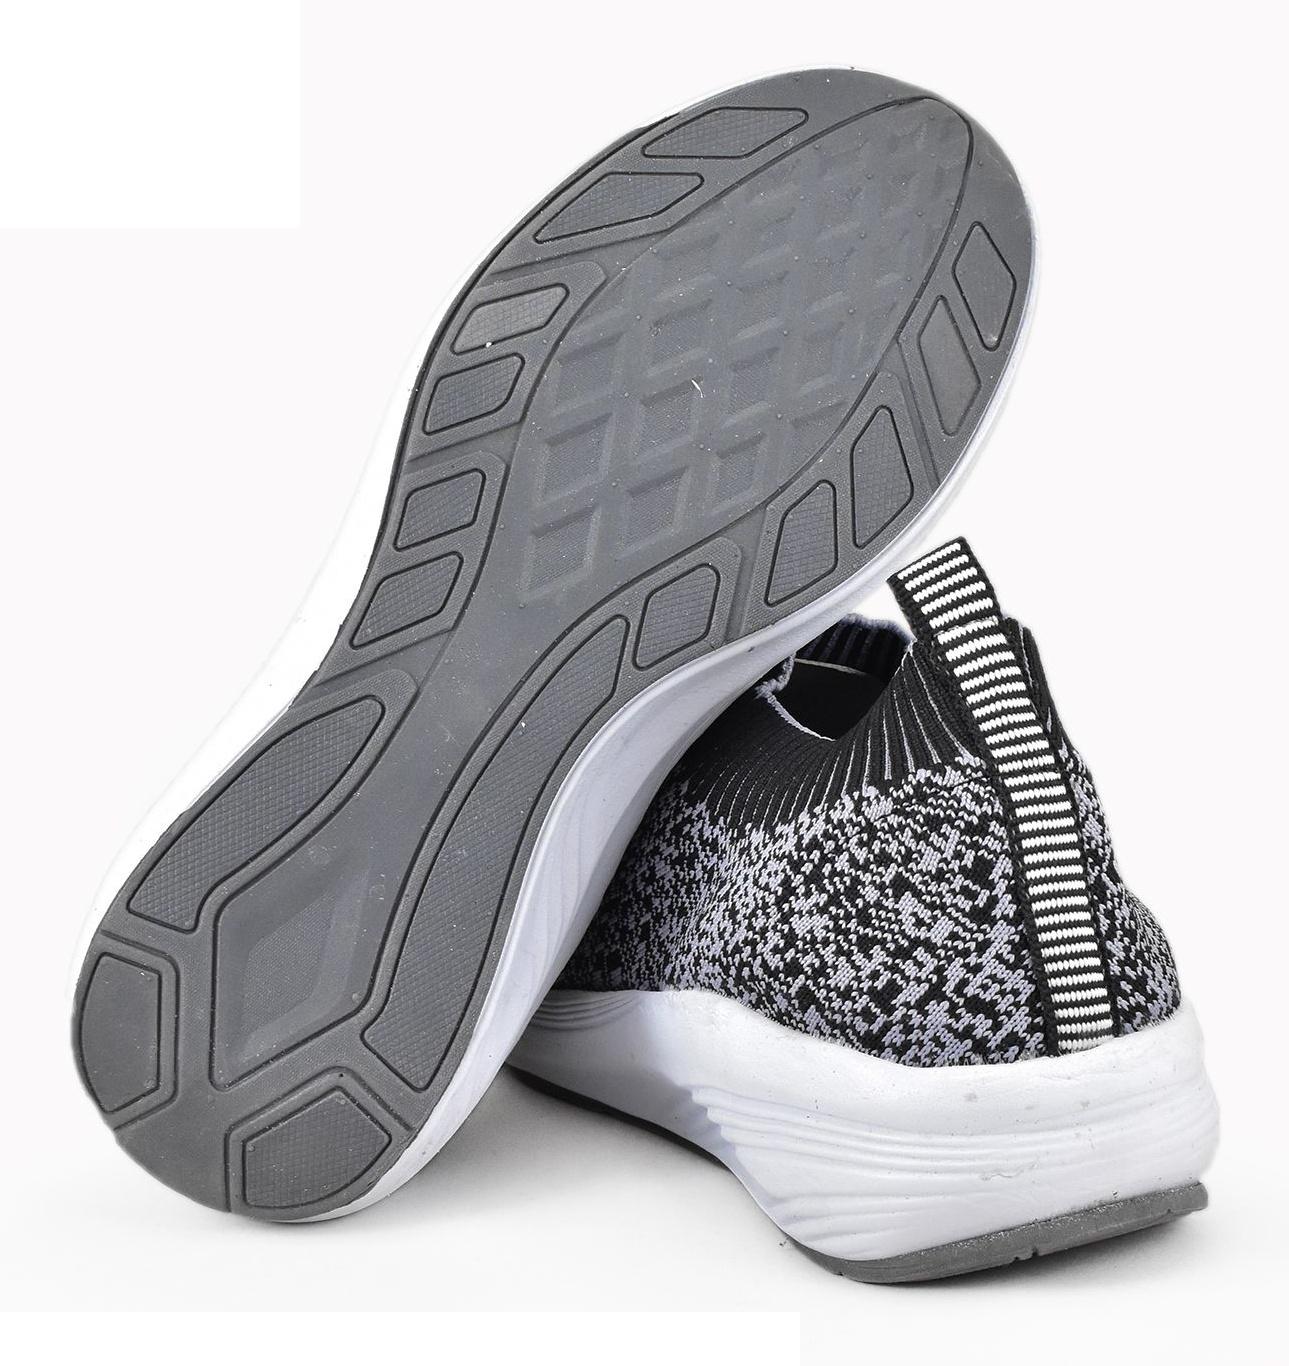 کفش مخصوص پیاده روی زنانه نسیم مدل آرتینا کد 4121